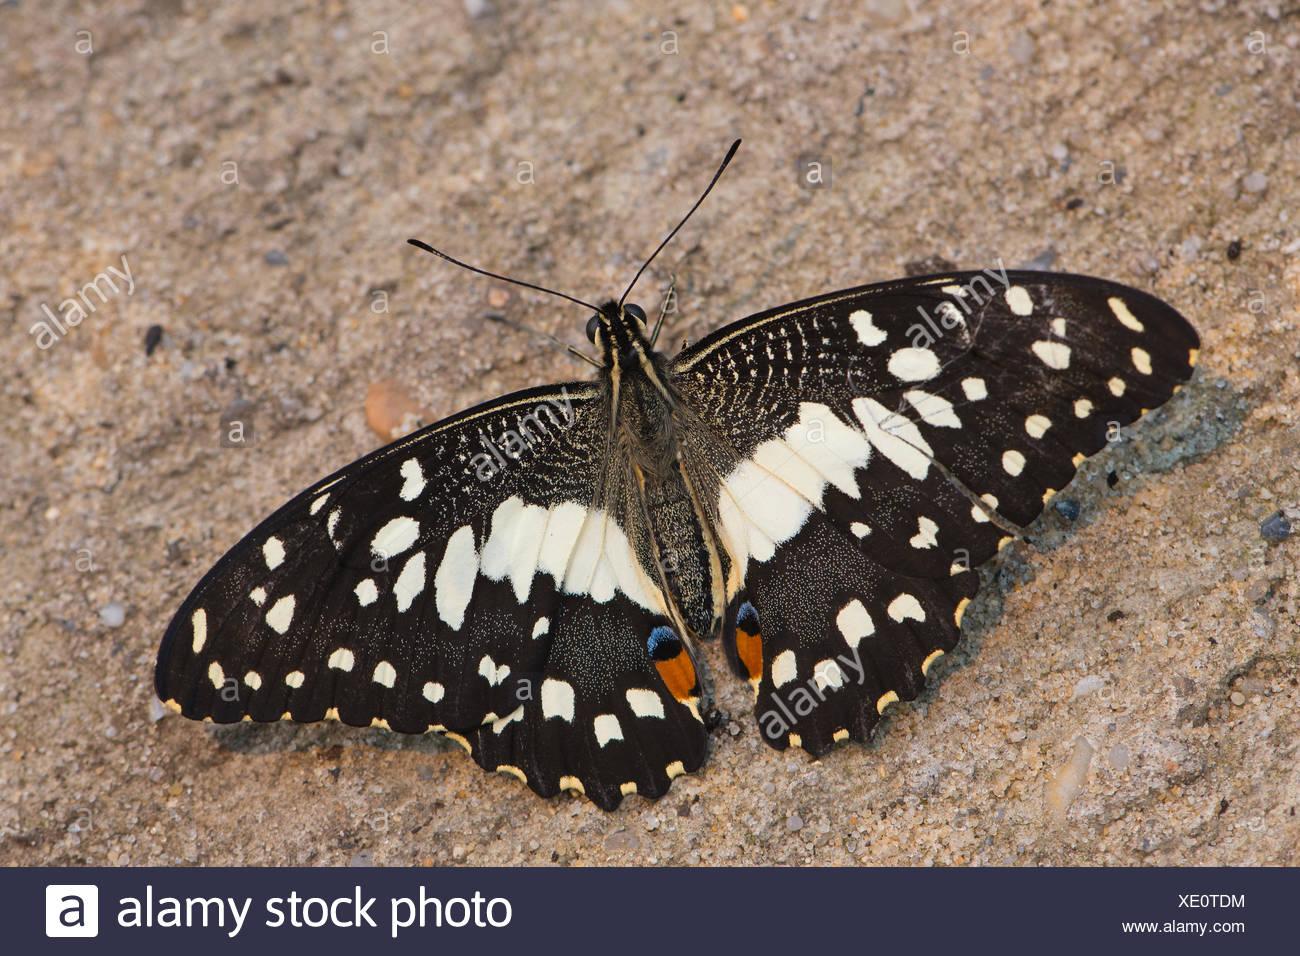 Calce comune Butterfly (Papilio demoleus), prigionieri Emsland, Bassa Sassonia, Germania Immagini Stock